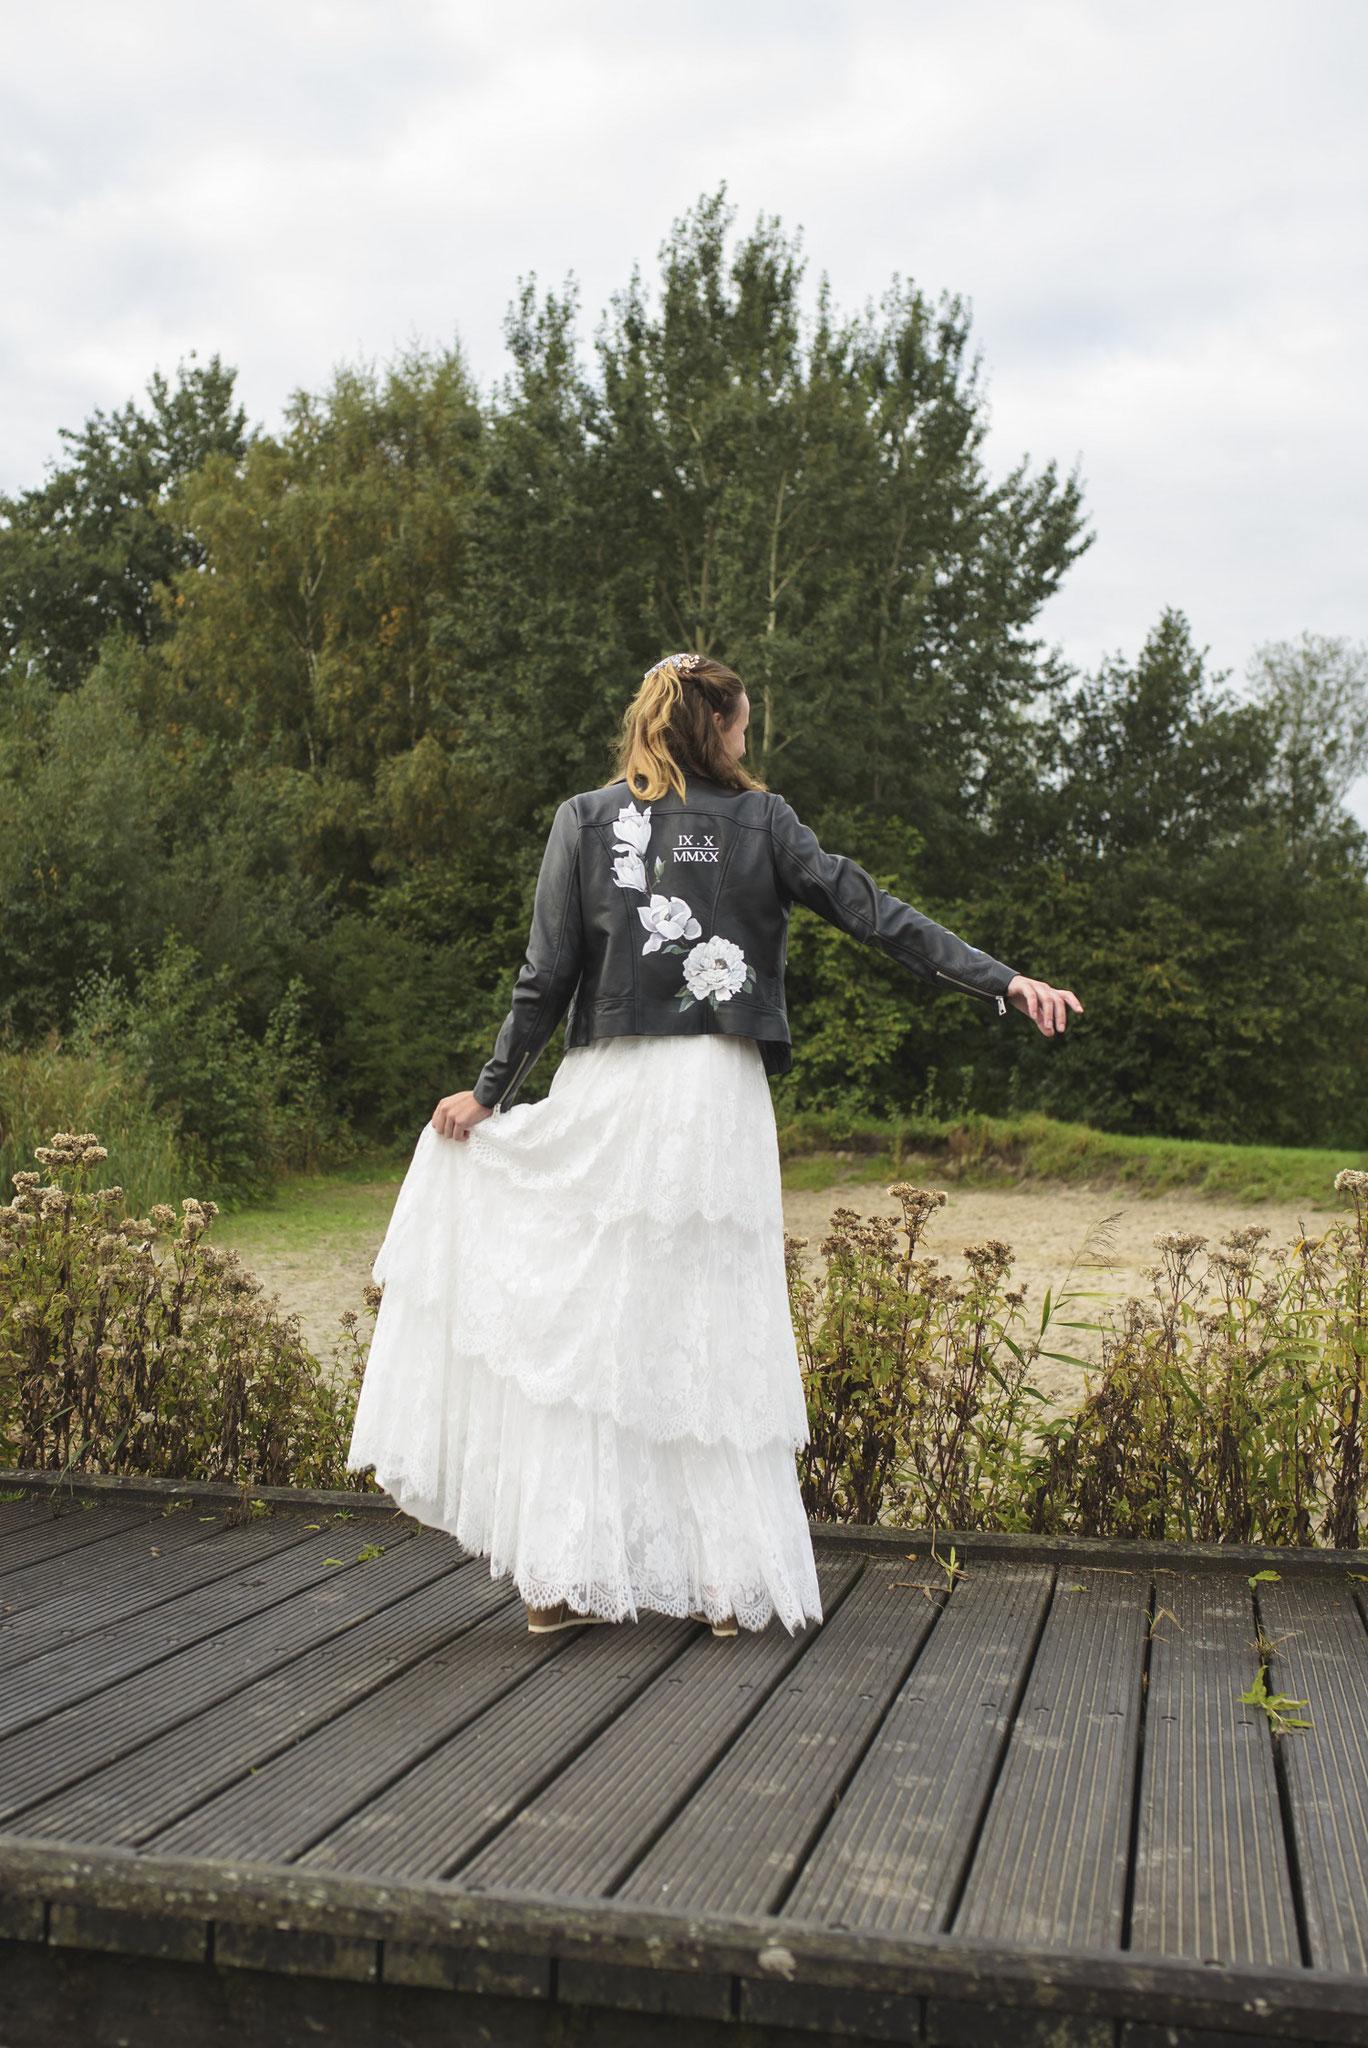 Foto: Poppinfotografie.nl